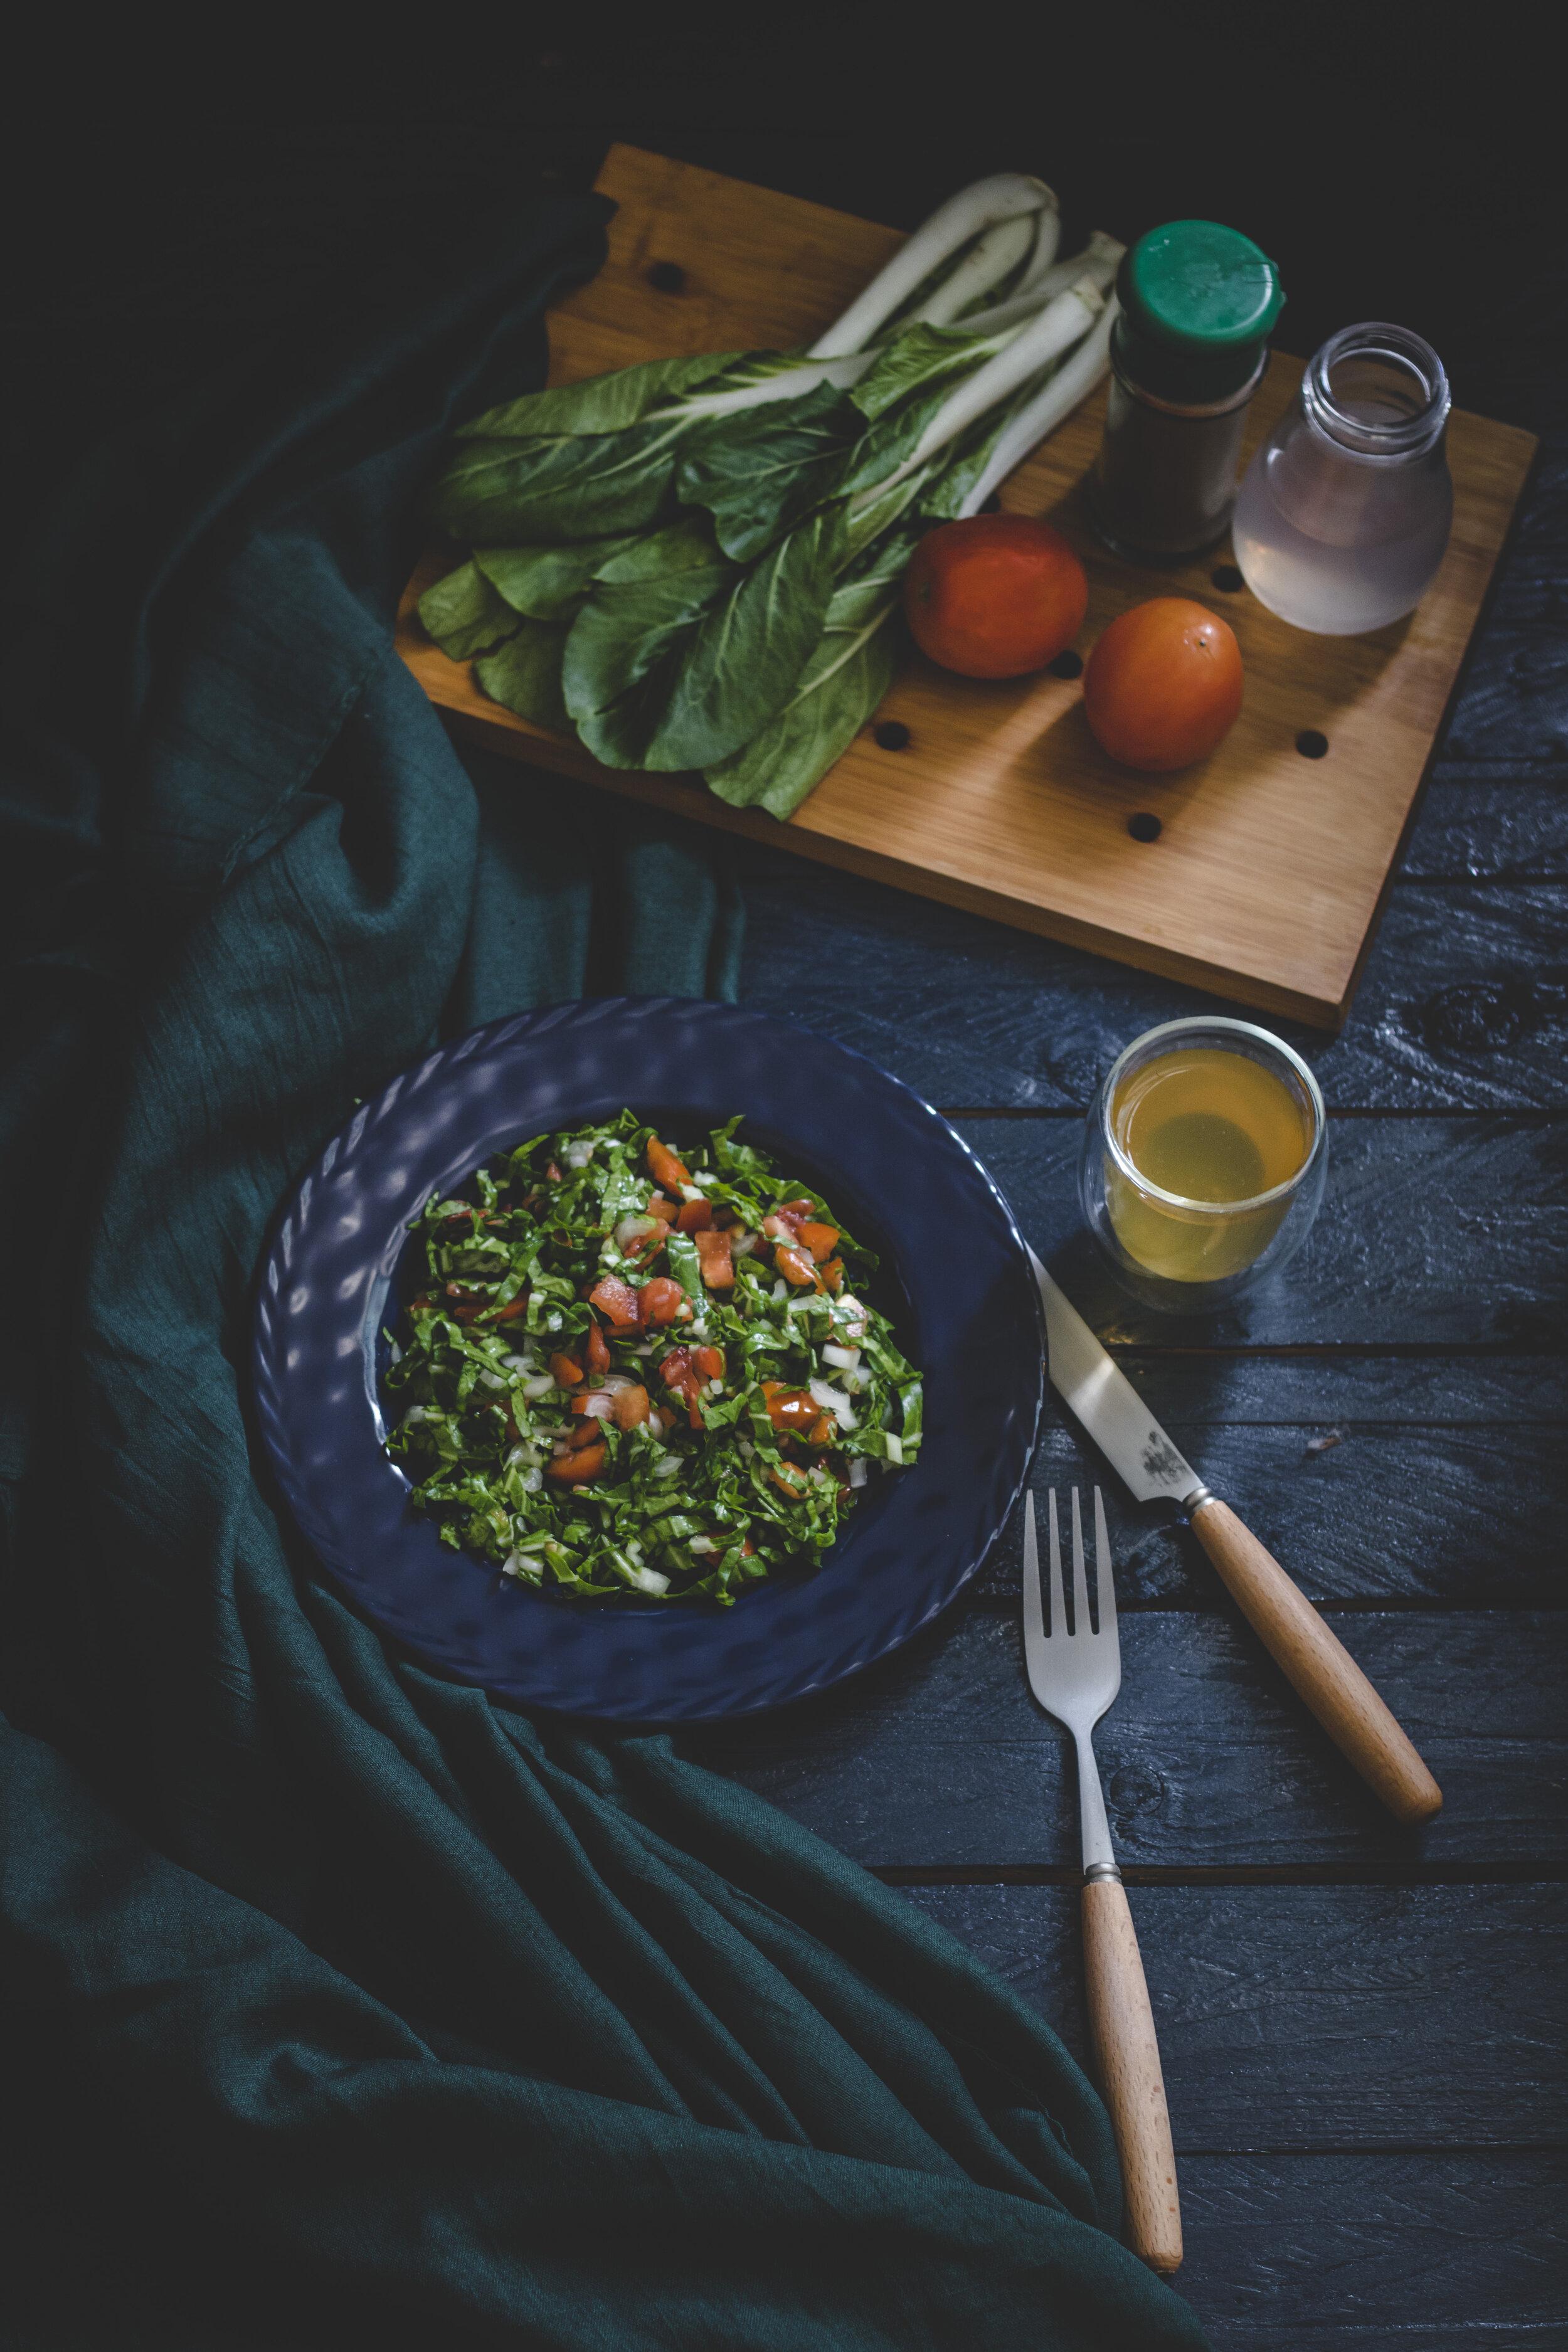 food at table